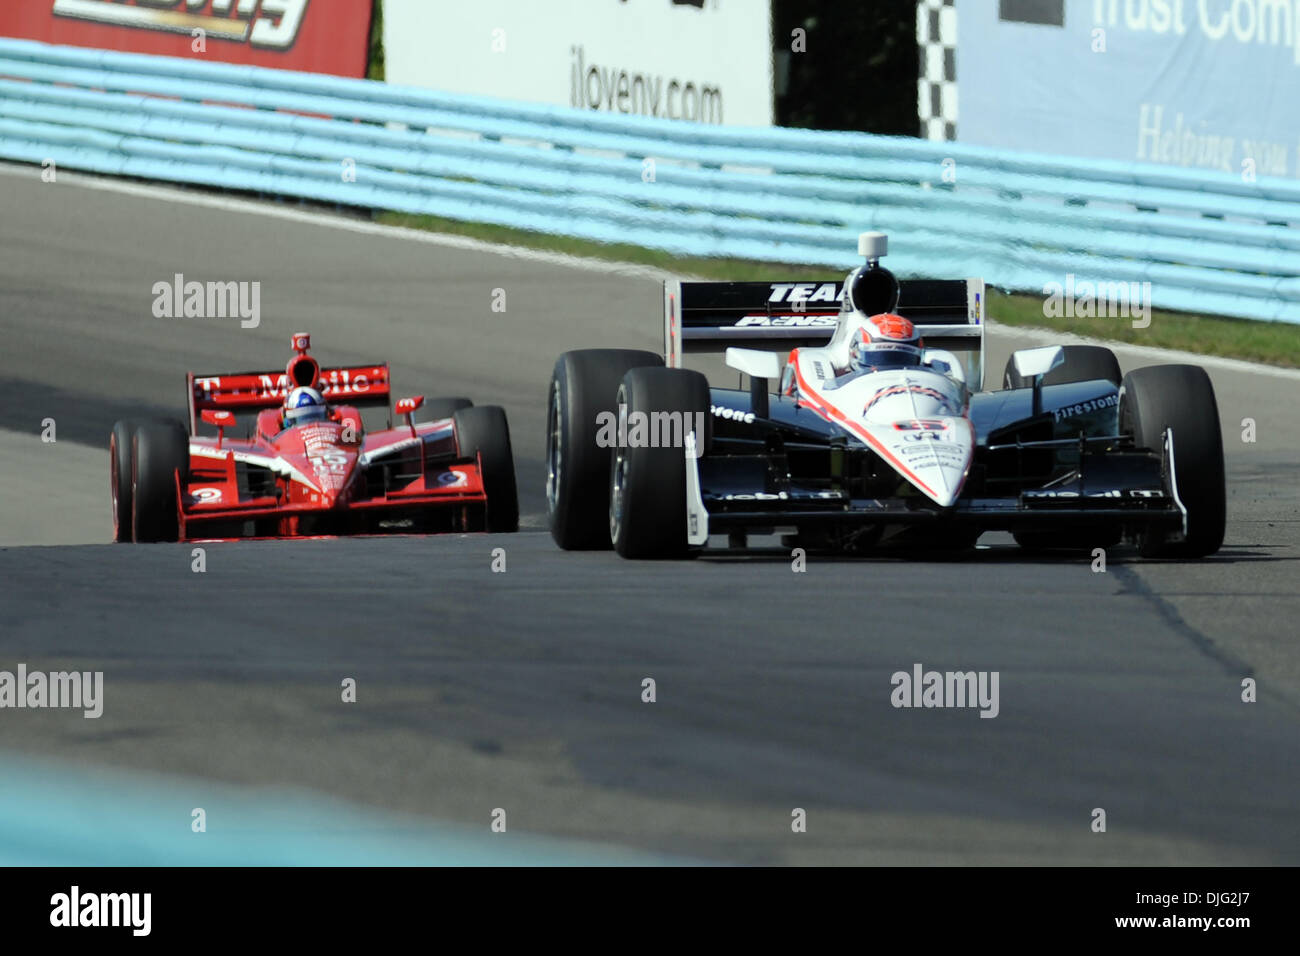 The Team Penske Honda Piloted By Ryan Bricoe Leads The Target Car Of